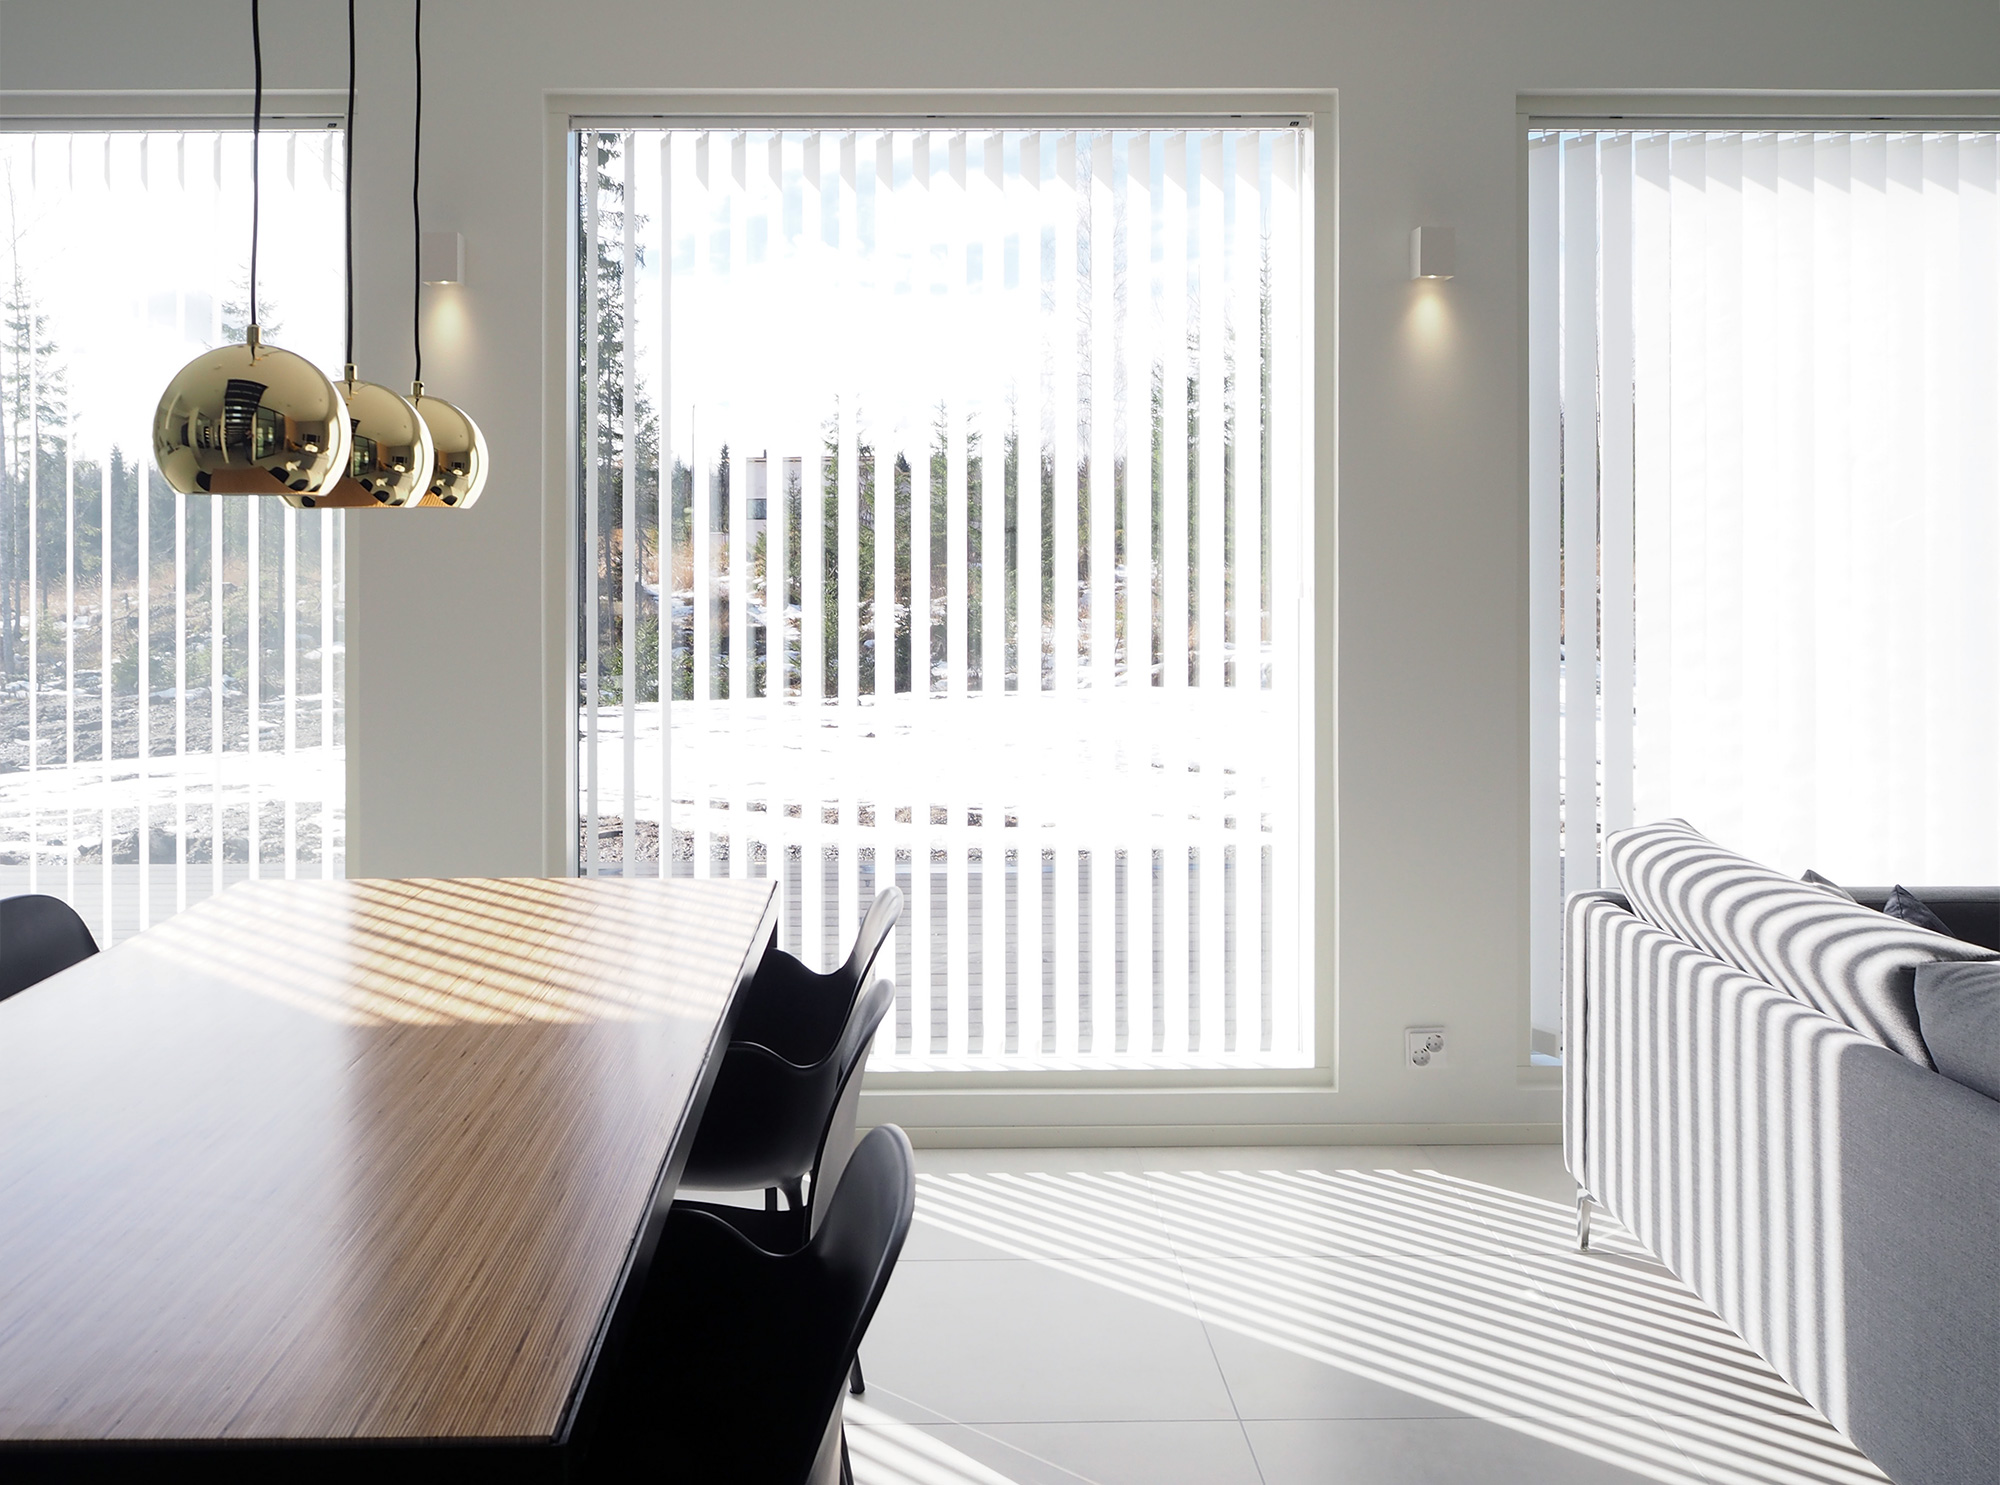 Luxaflex lamelliverhot olohuoneessa